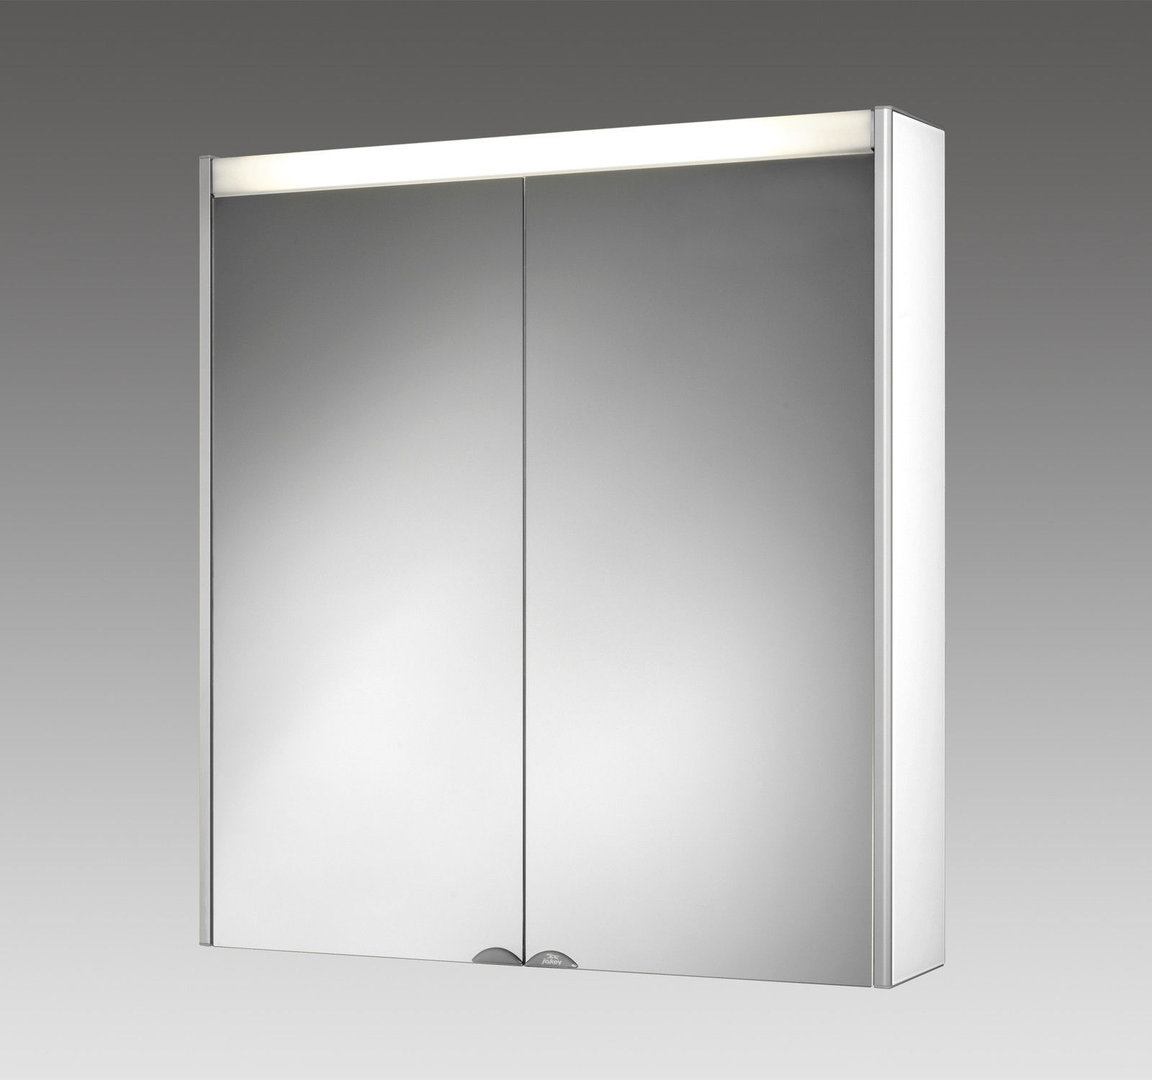 jokey dekoralu ls blende wei spiegelschrank material aluminium. Black Bedroom Furniture Sets. Home Design Ideas